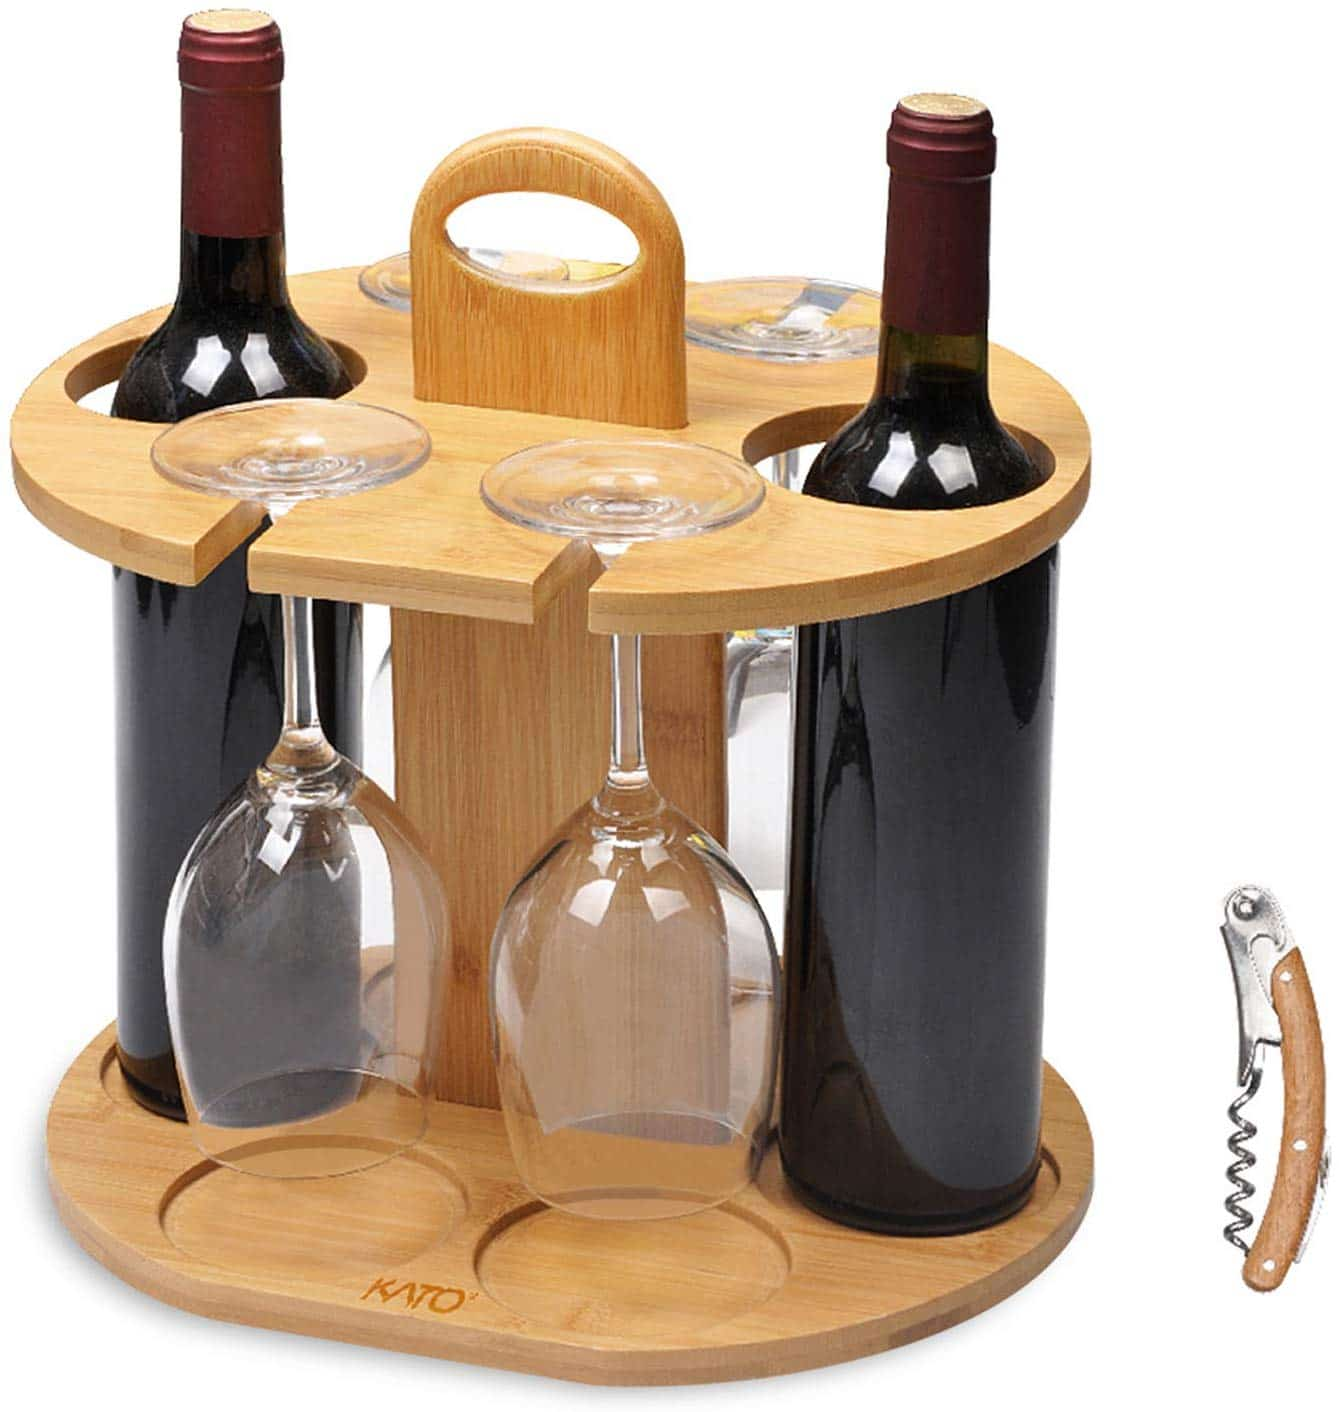 7. Wine Caddy